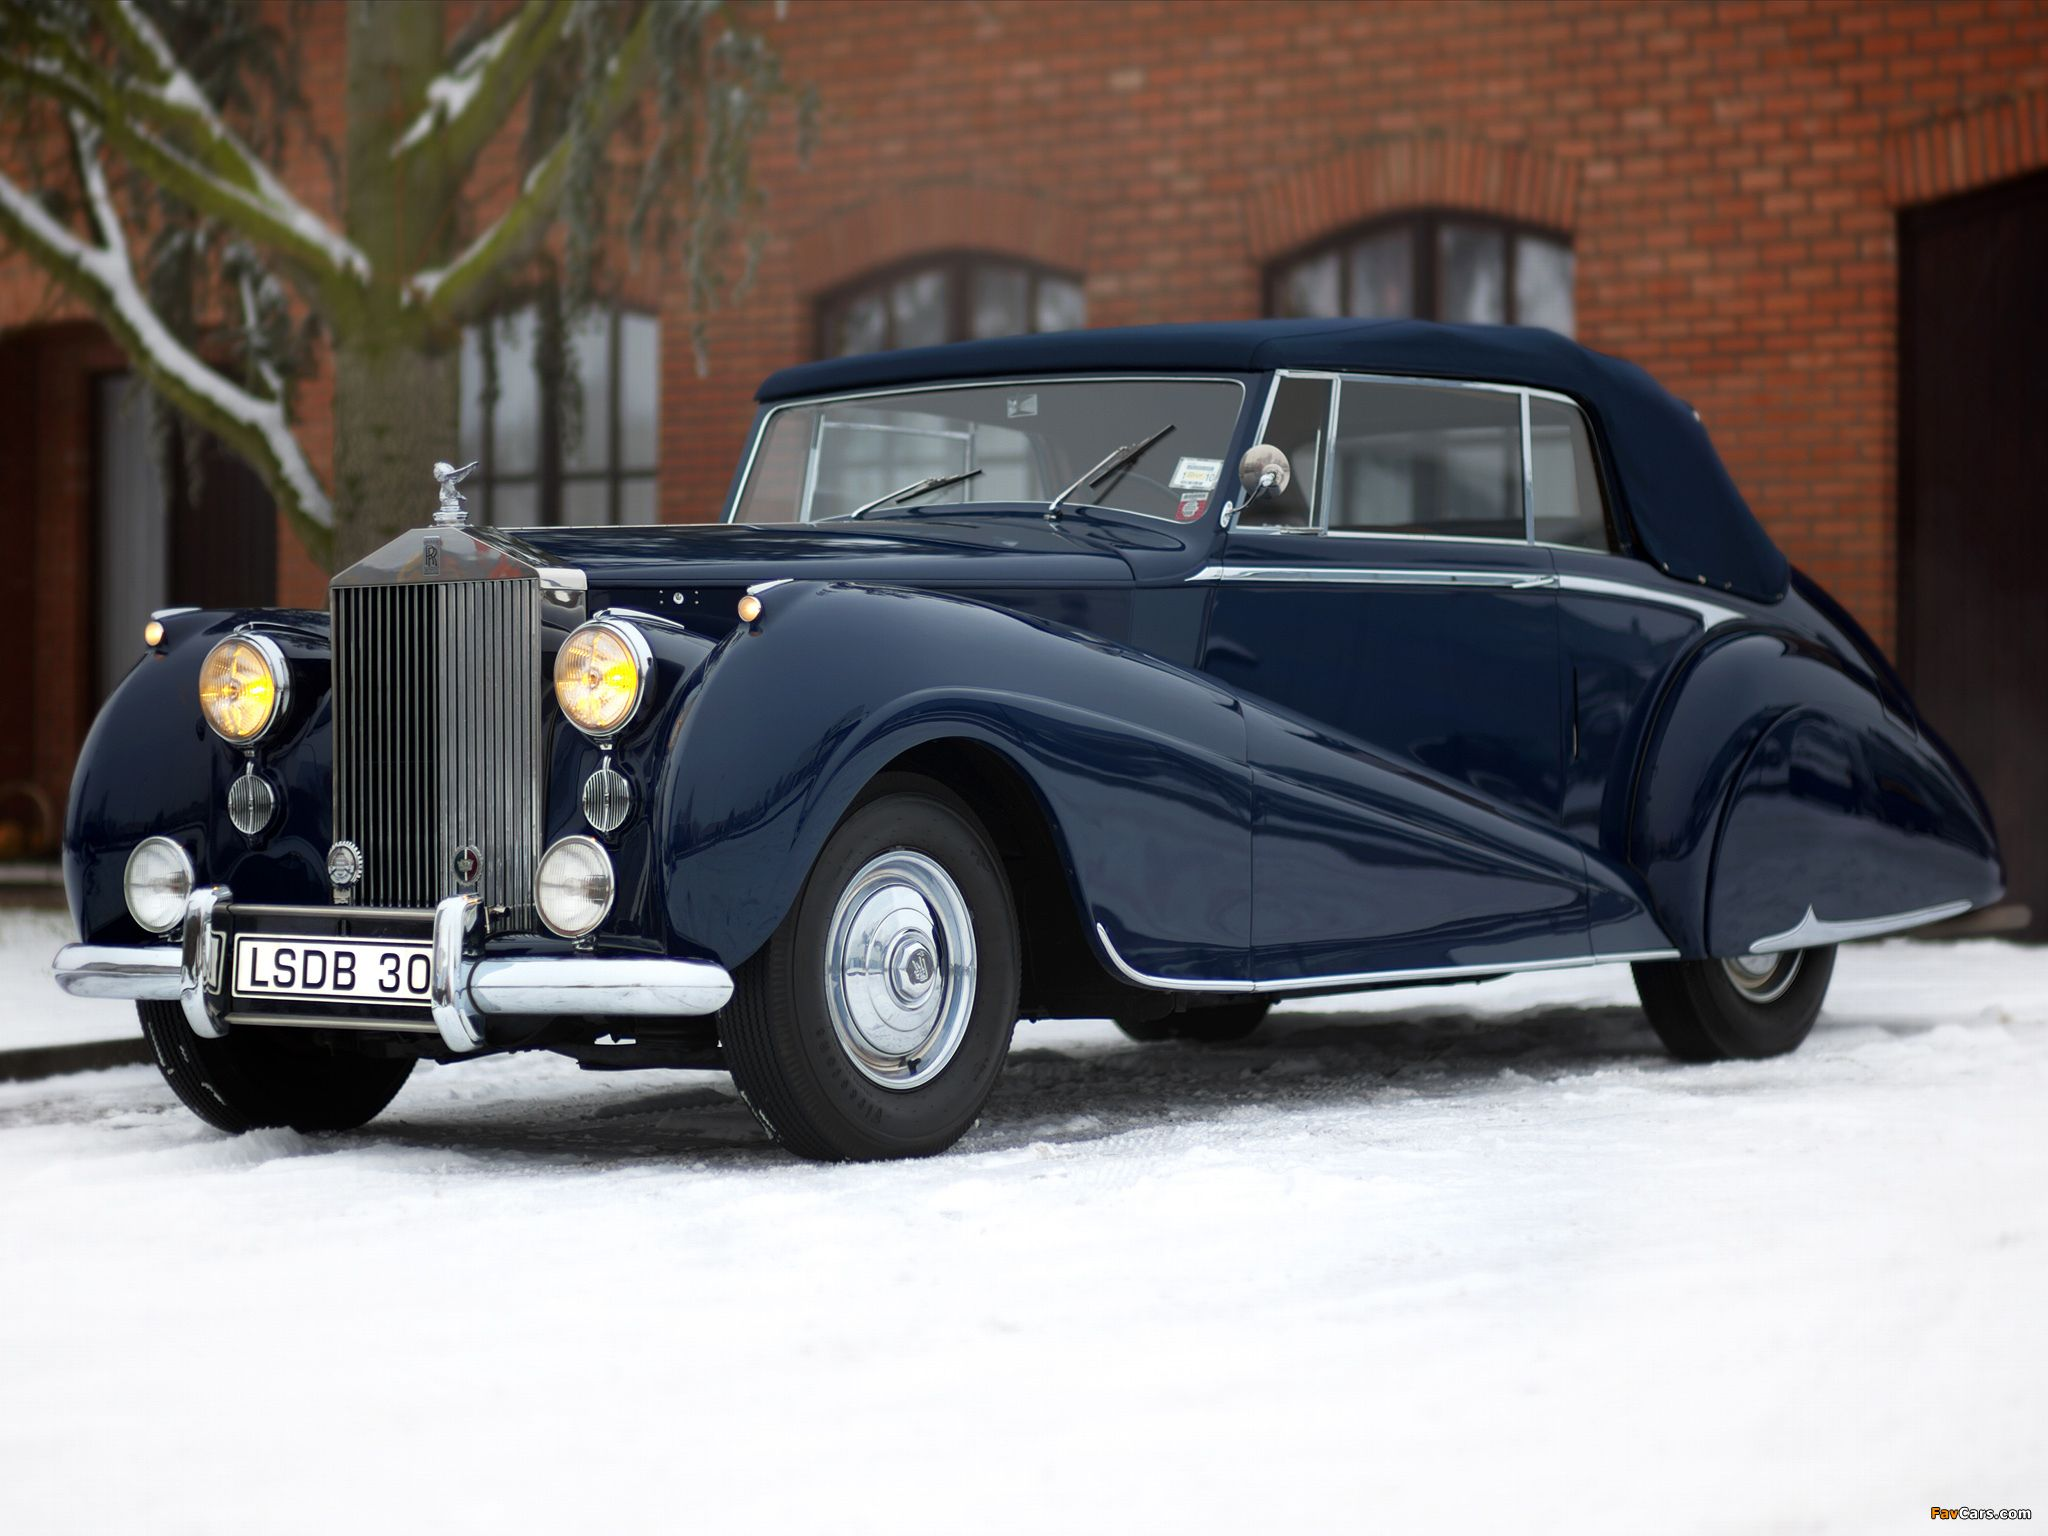 Rolls royce silver dawn drophead coupe by park ward 1950